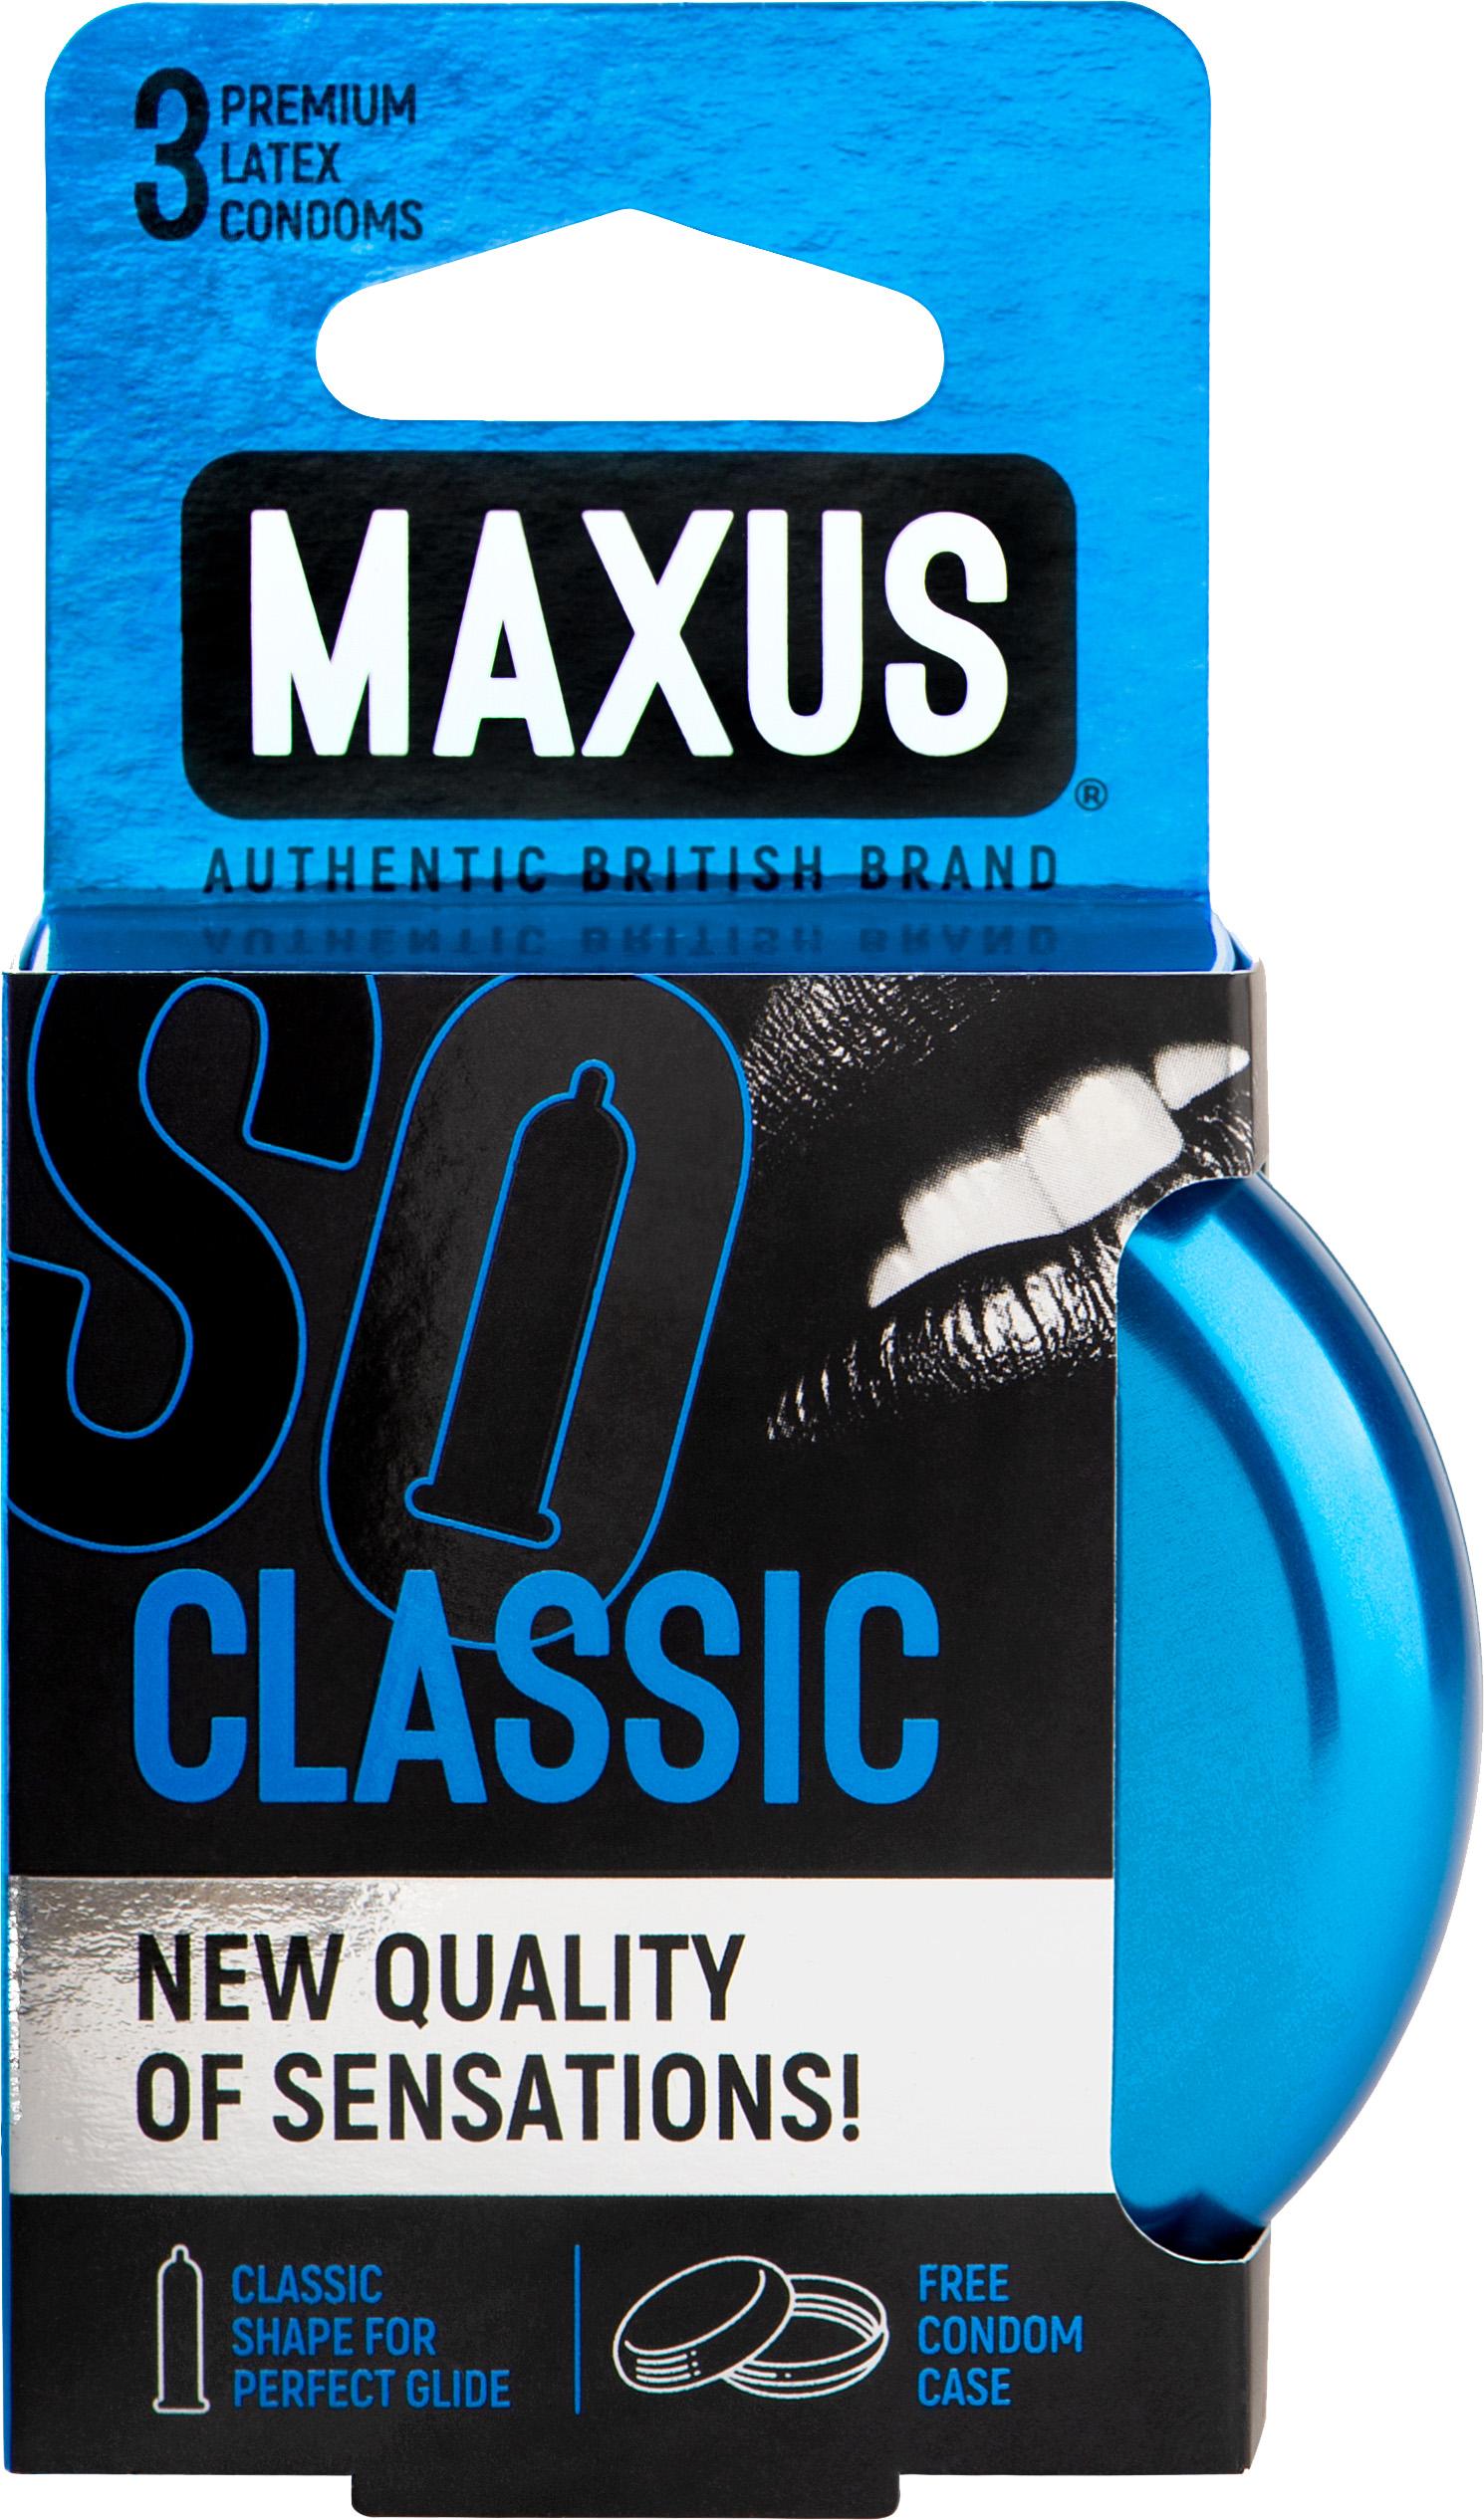 Максус презервативы №3 Классик